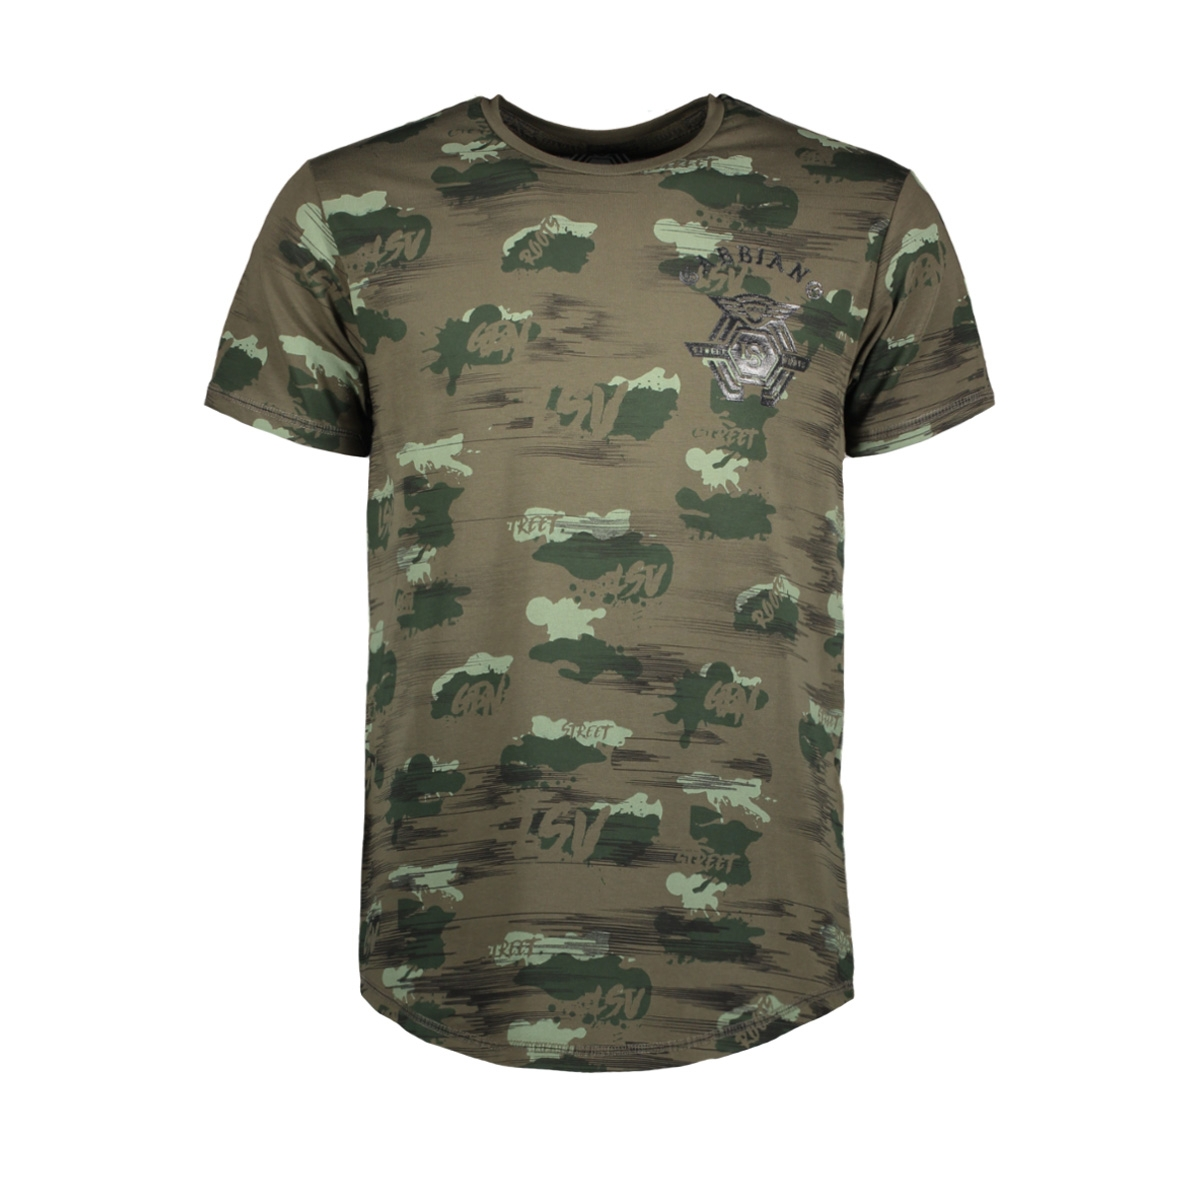 13862 gabbiano t-shirt army